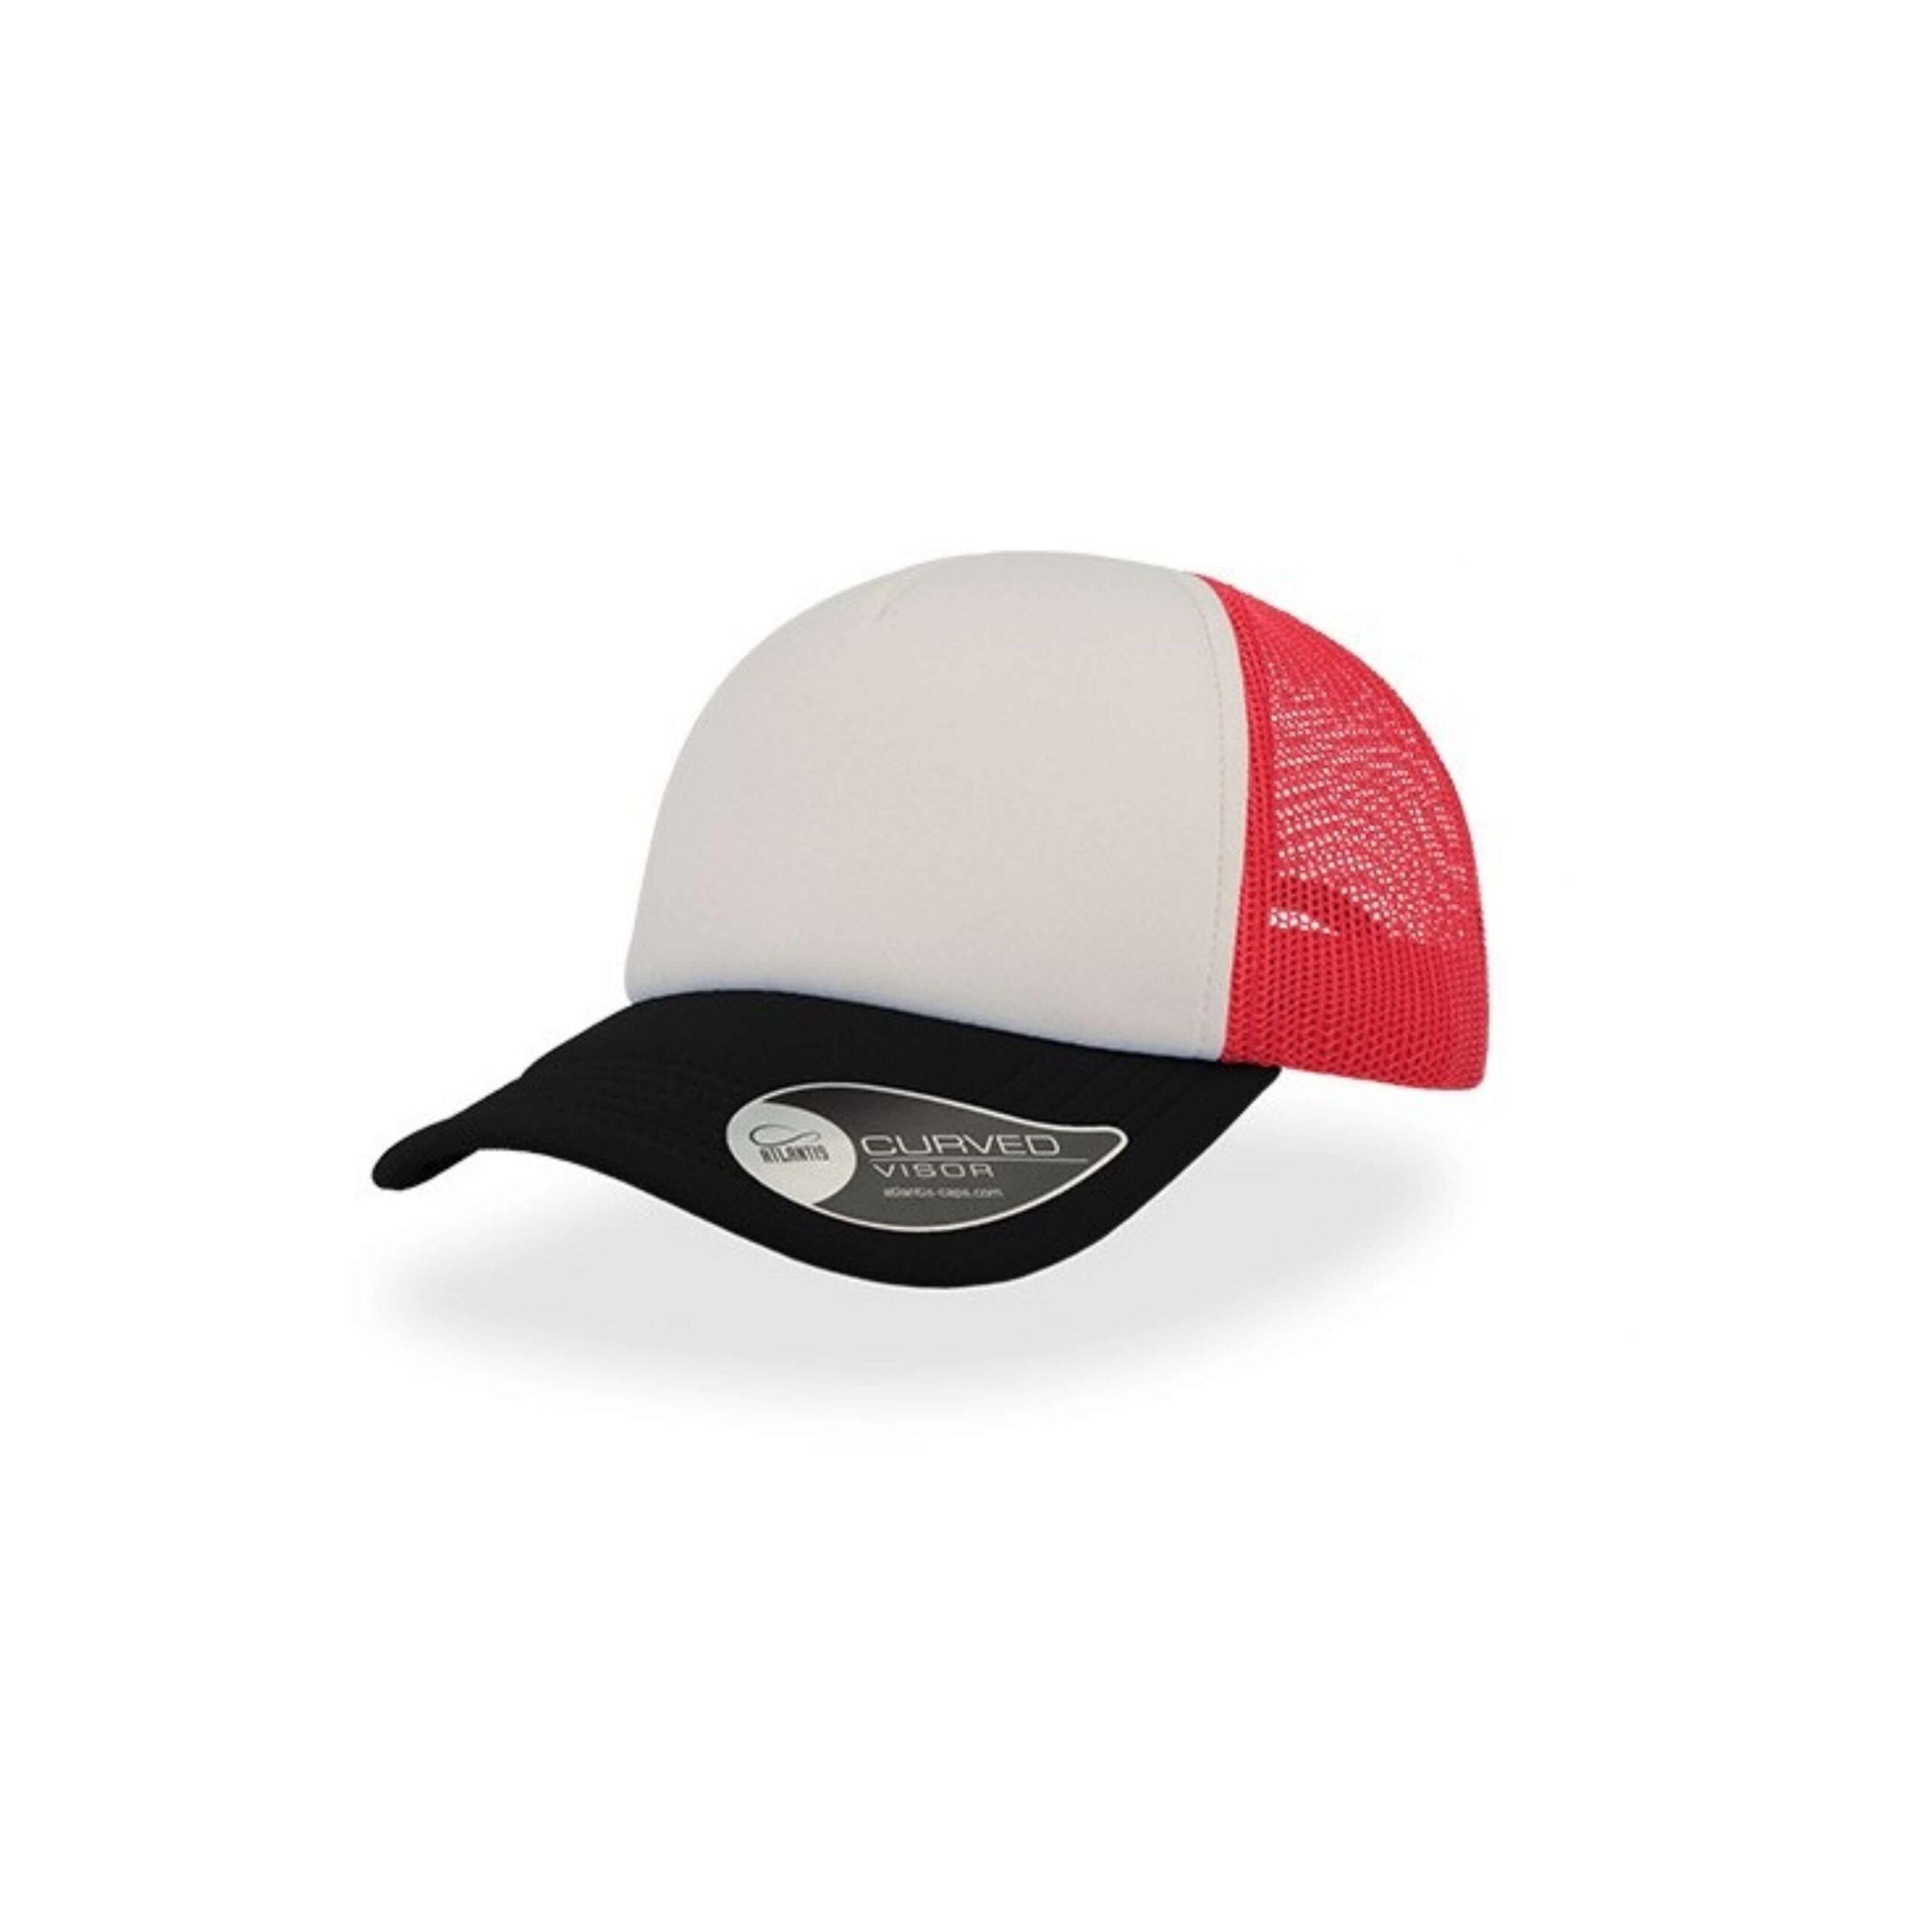 hat-atlantis-mesh-back-01901-18